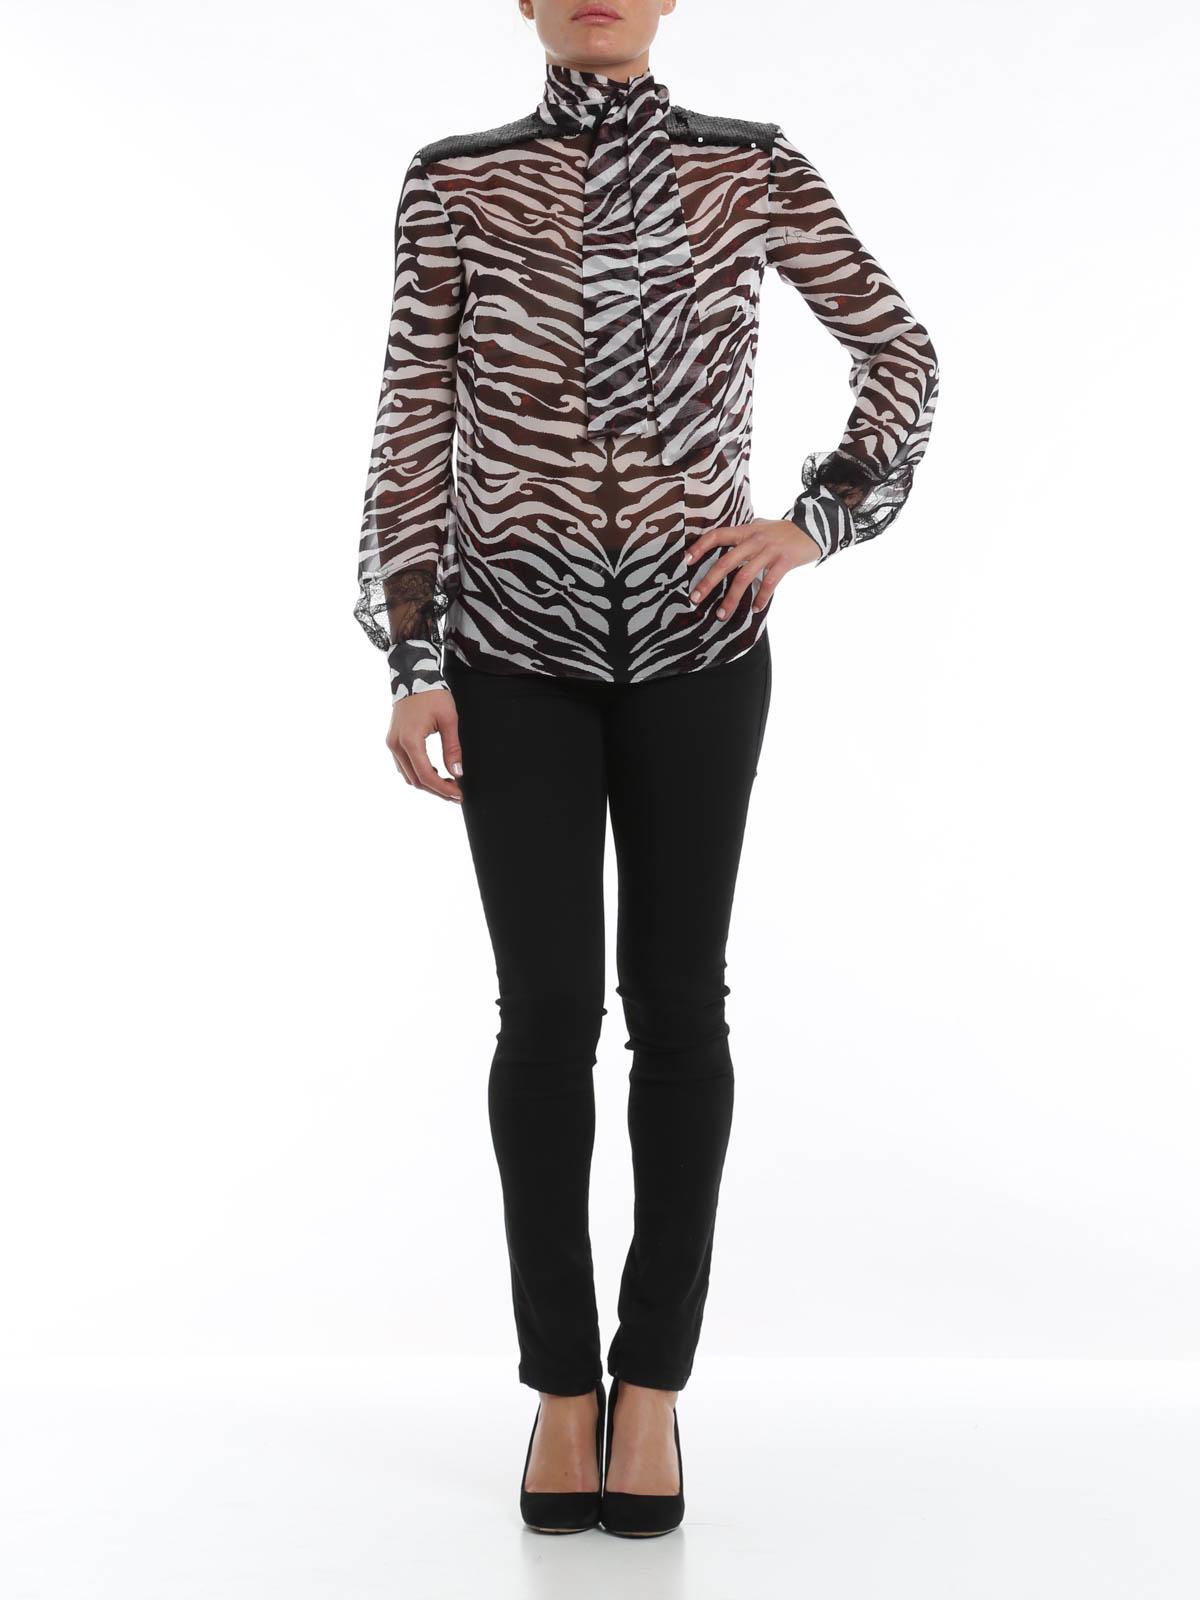 Zebra Print Blouse 74